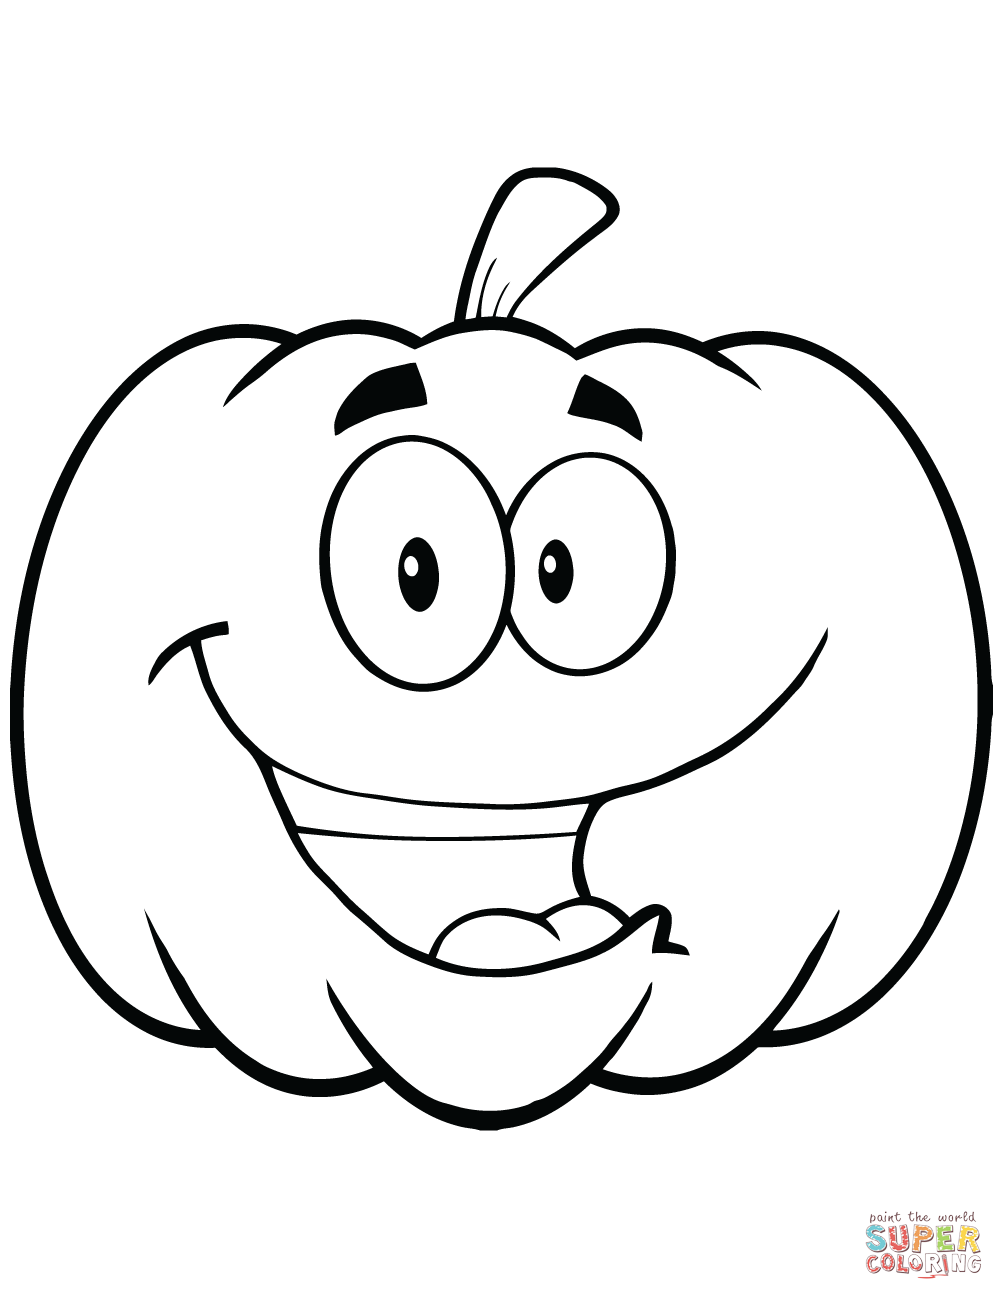 1004x1300 Cartoon Halloween Pumpkin Coloring Page Free Printable Coloring